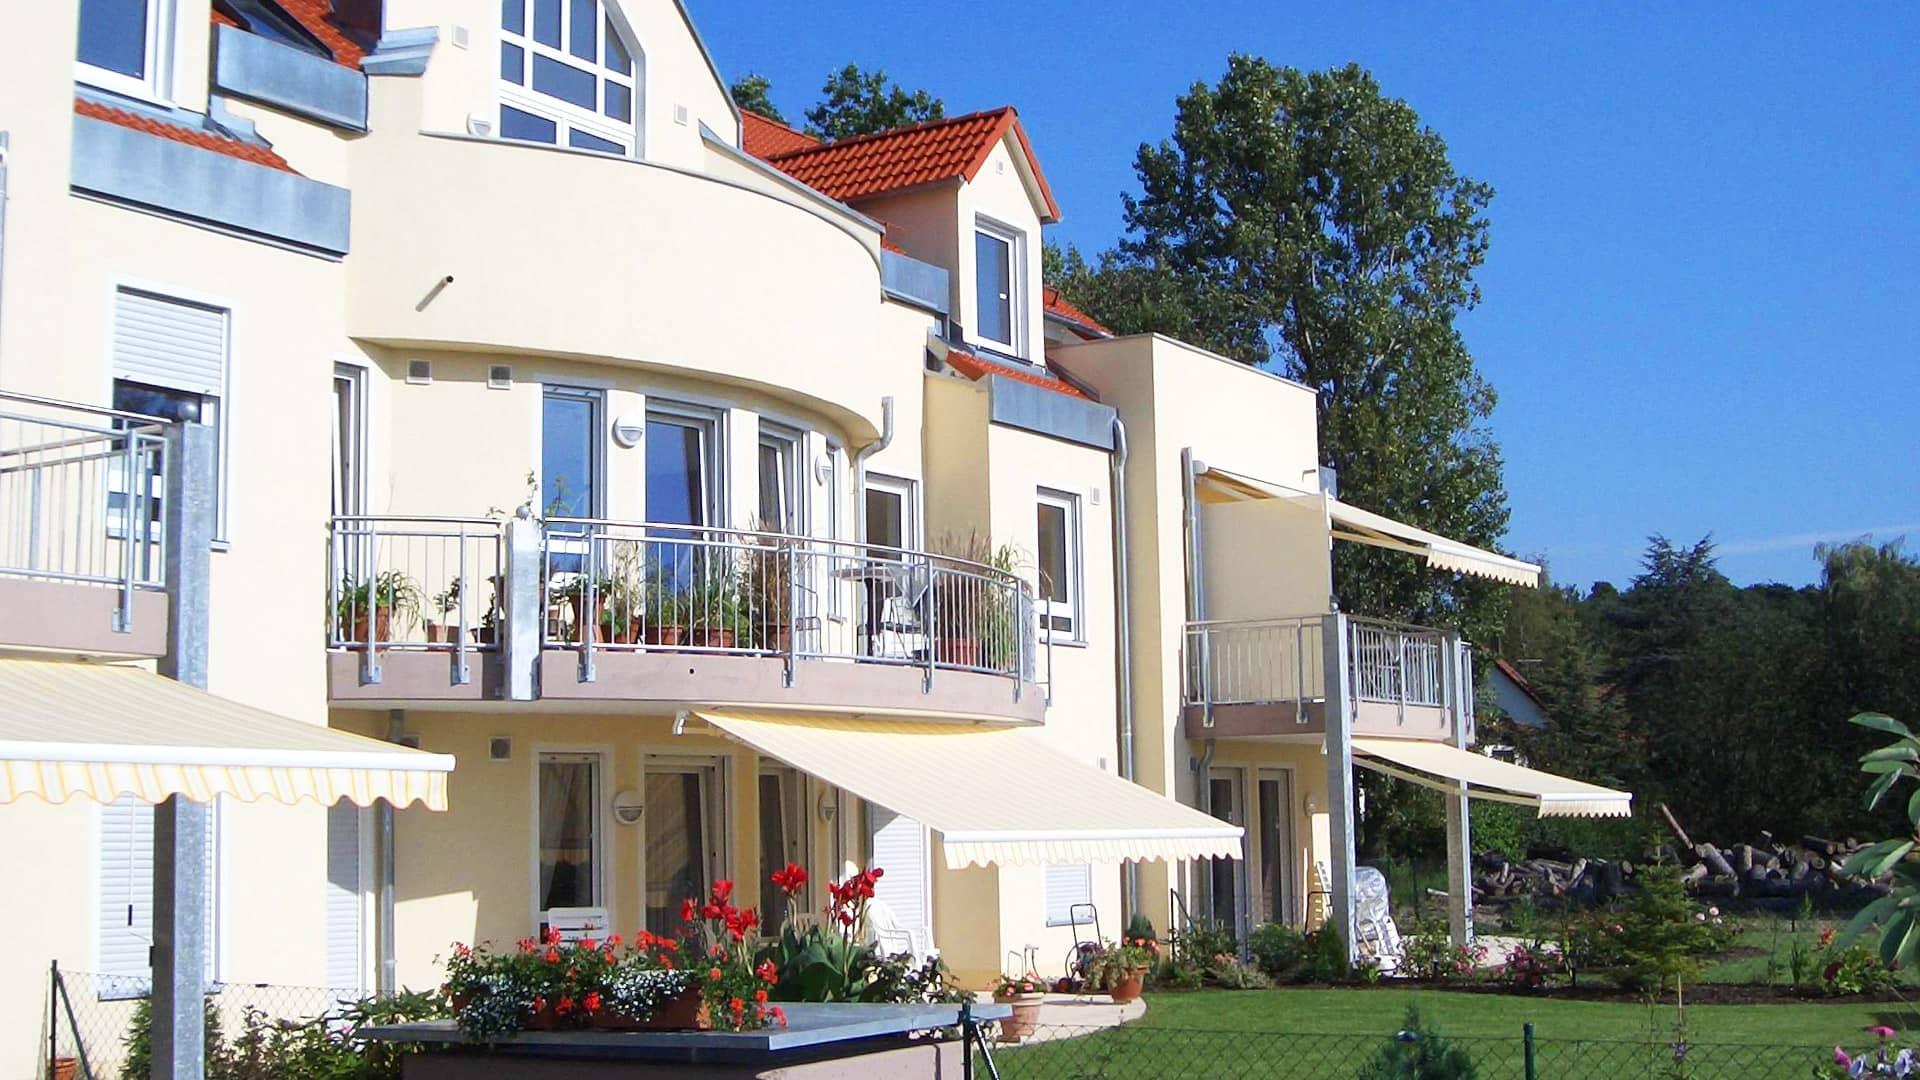 balkon good balkon alzey bausatz with balkon perfect. Black Bedroom Furniture Sets. Home Design Ideas